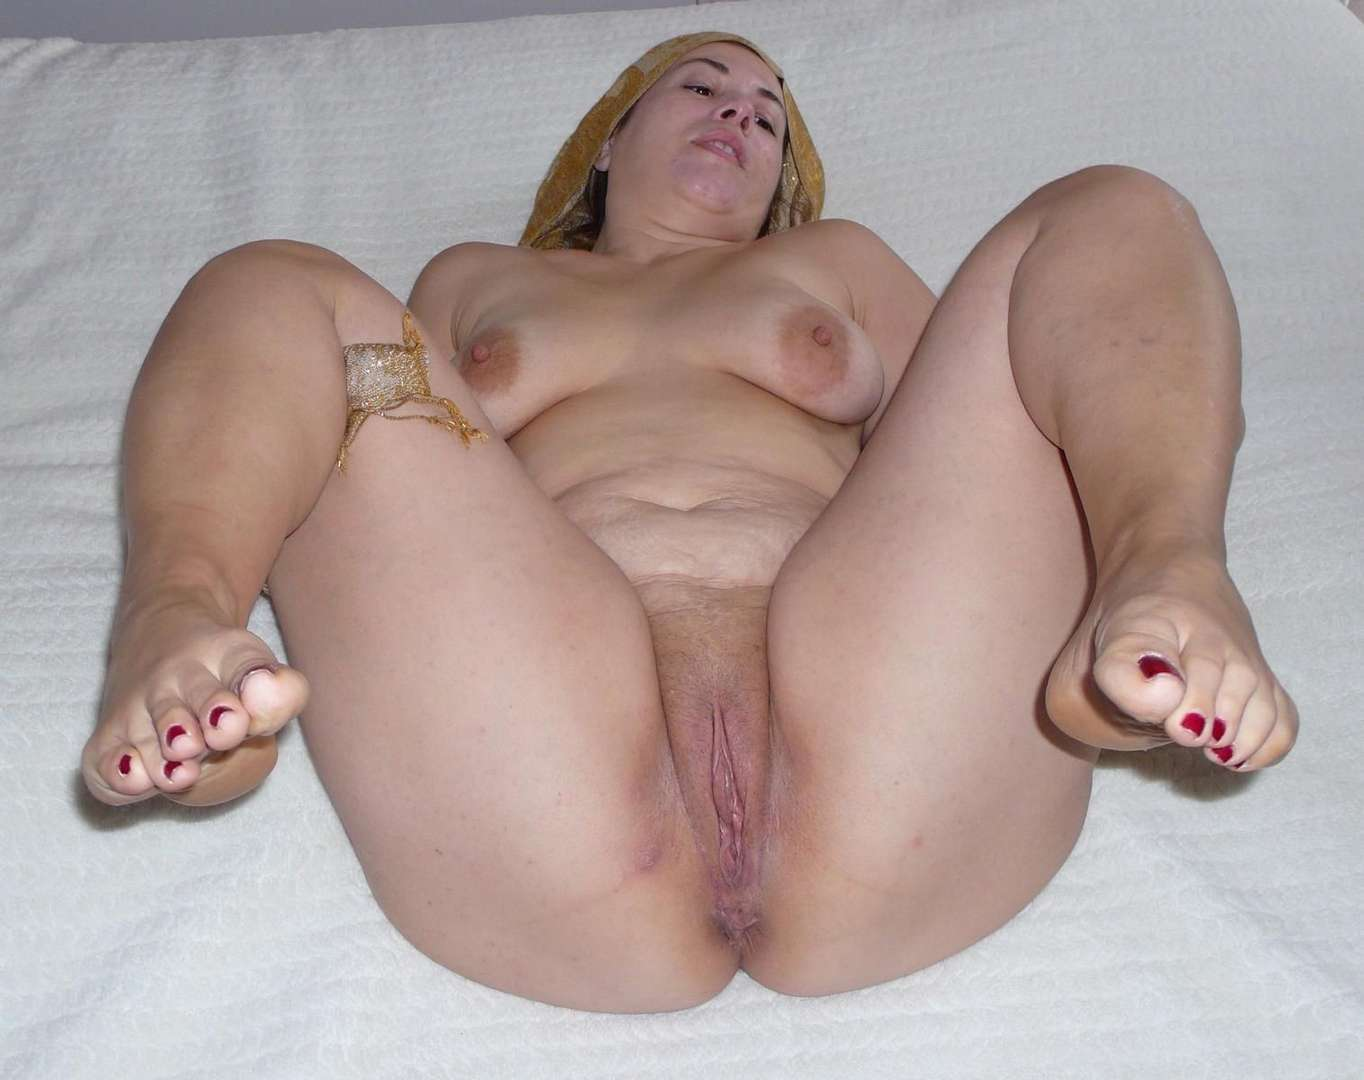 turkish hot girl naked